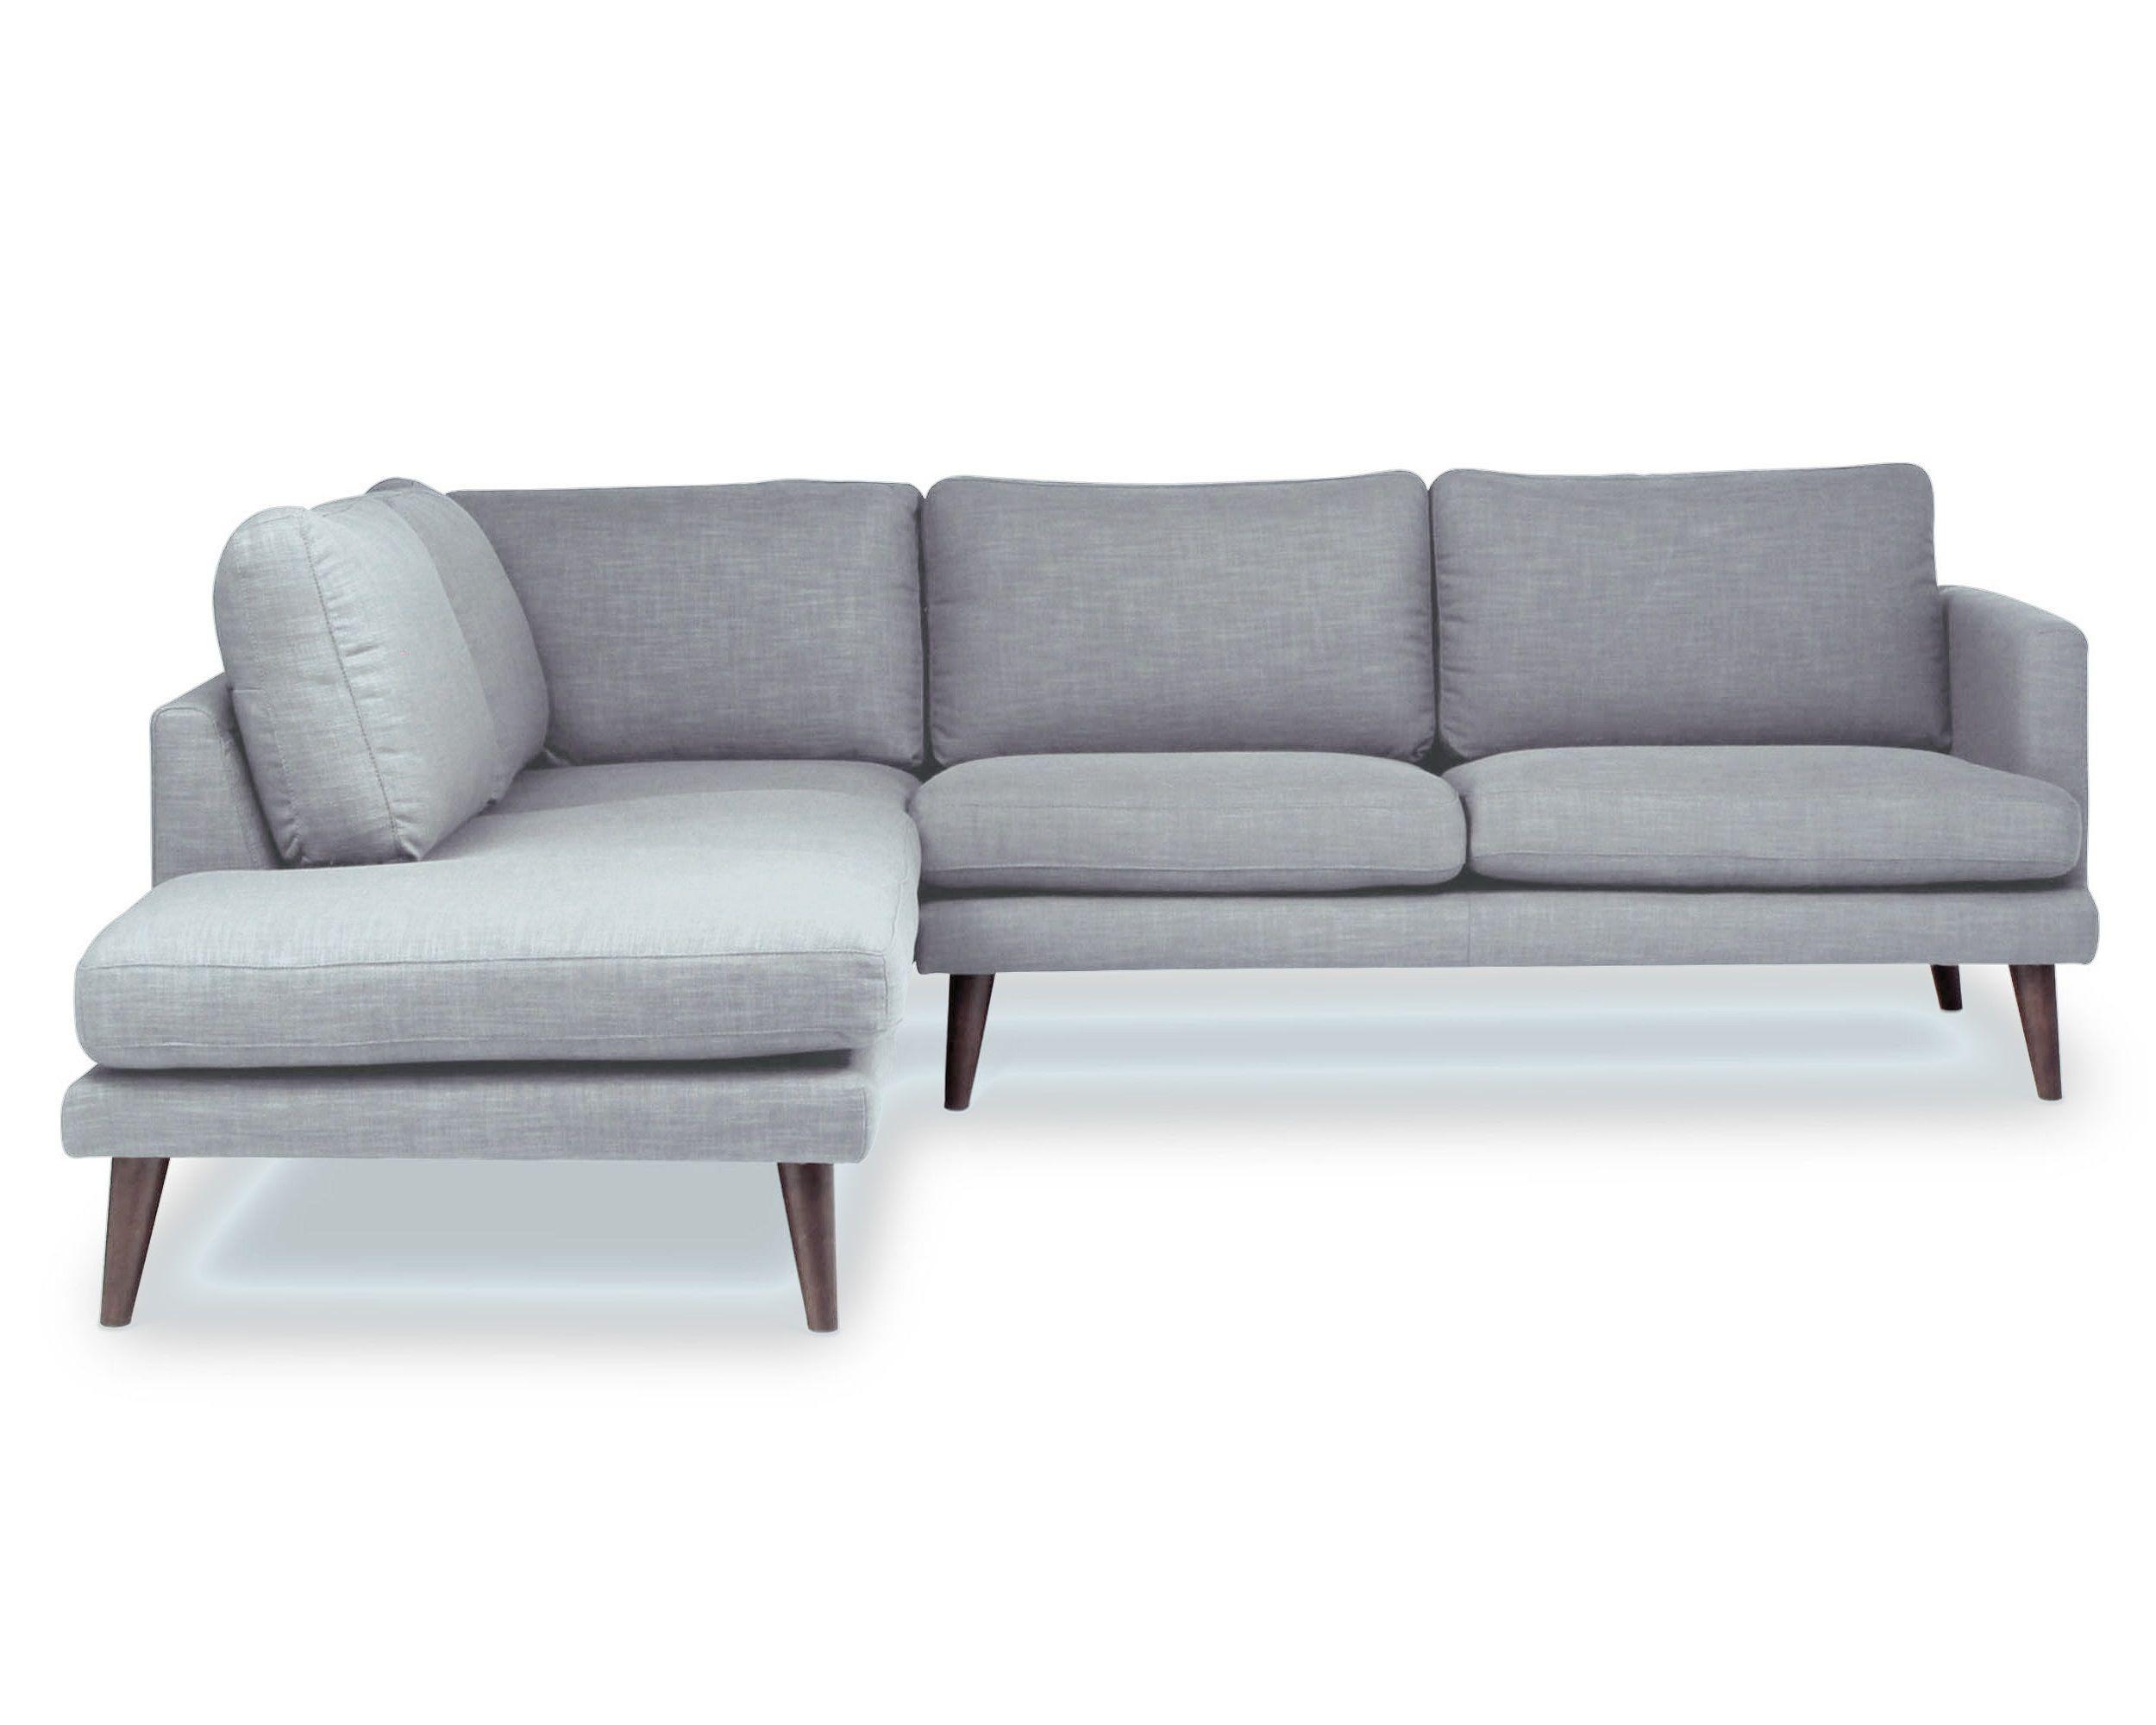 hugo corner sofa future lounge pinterest corner living rh pinterest com